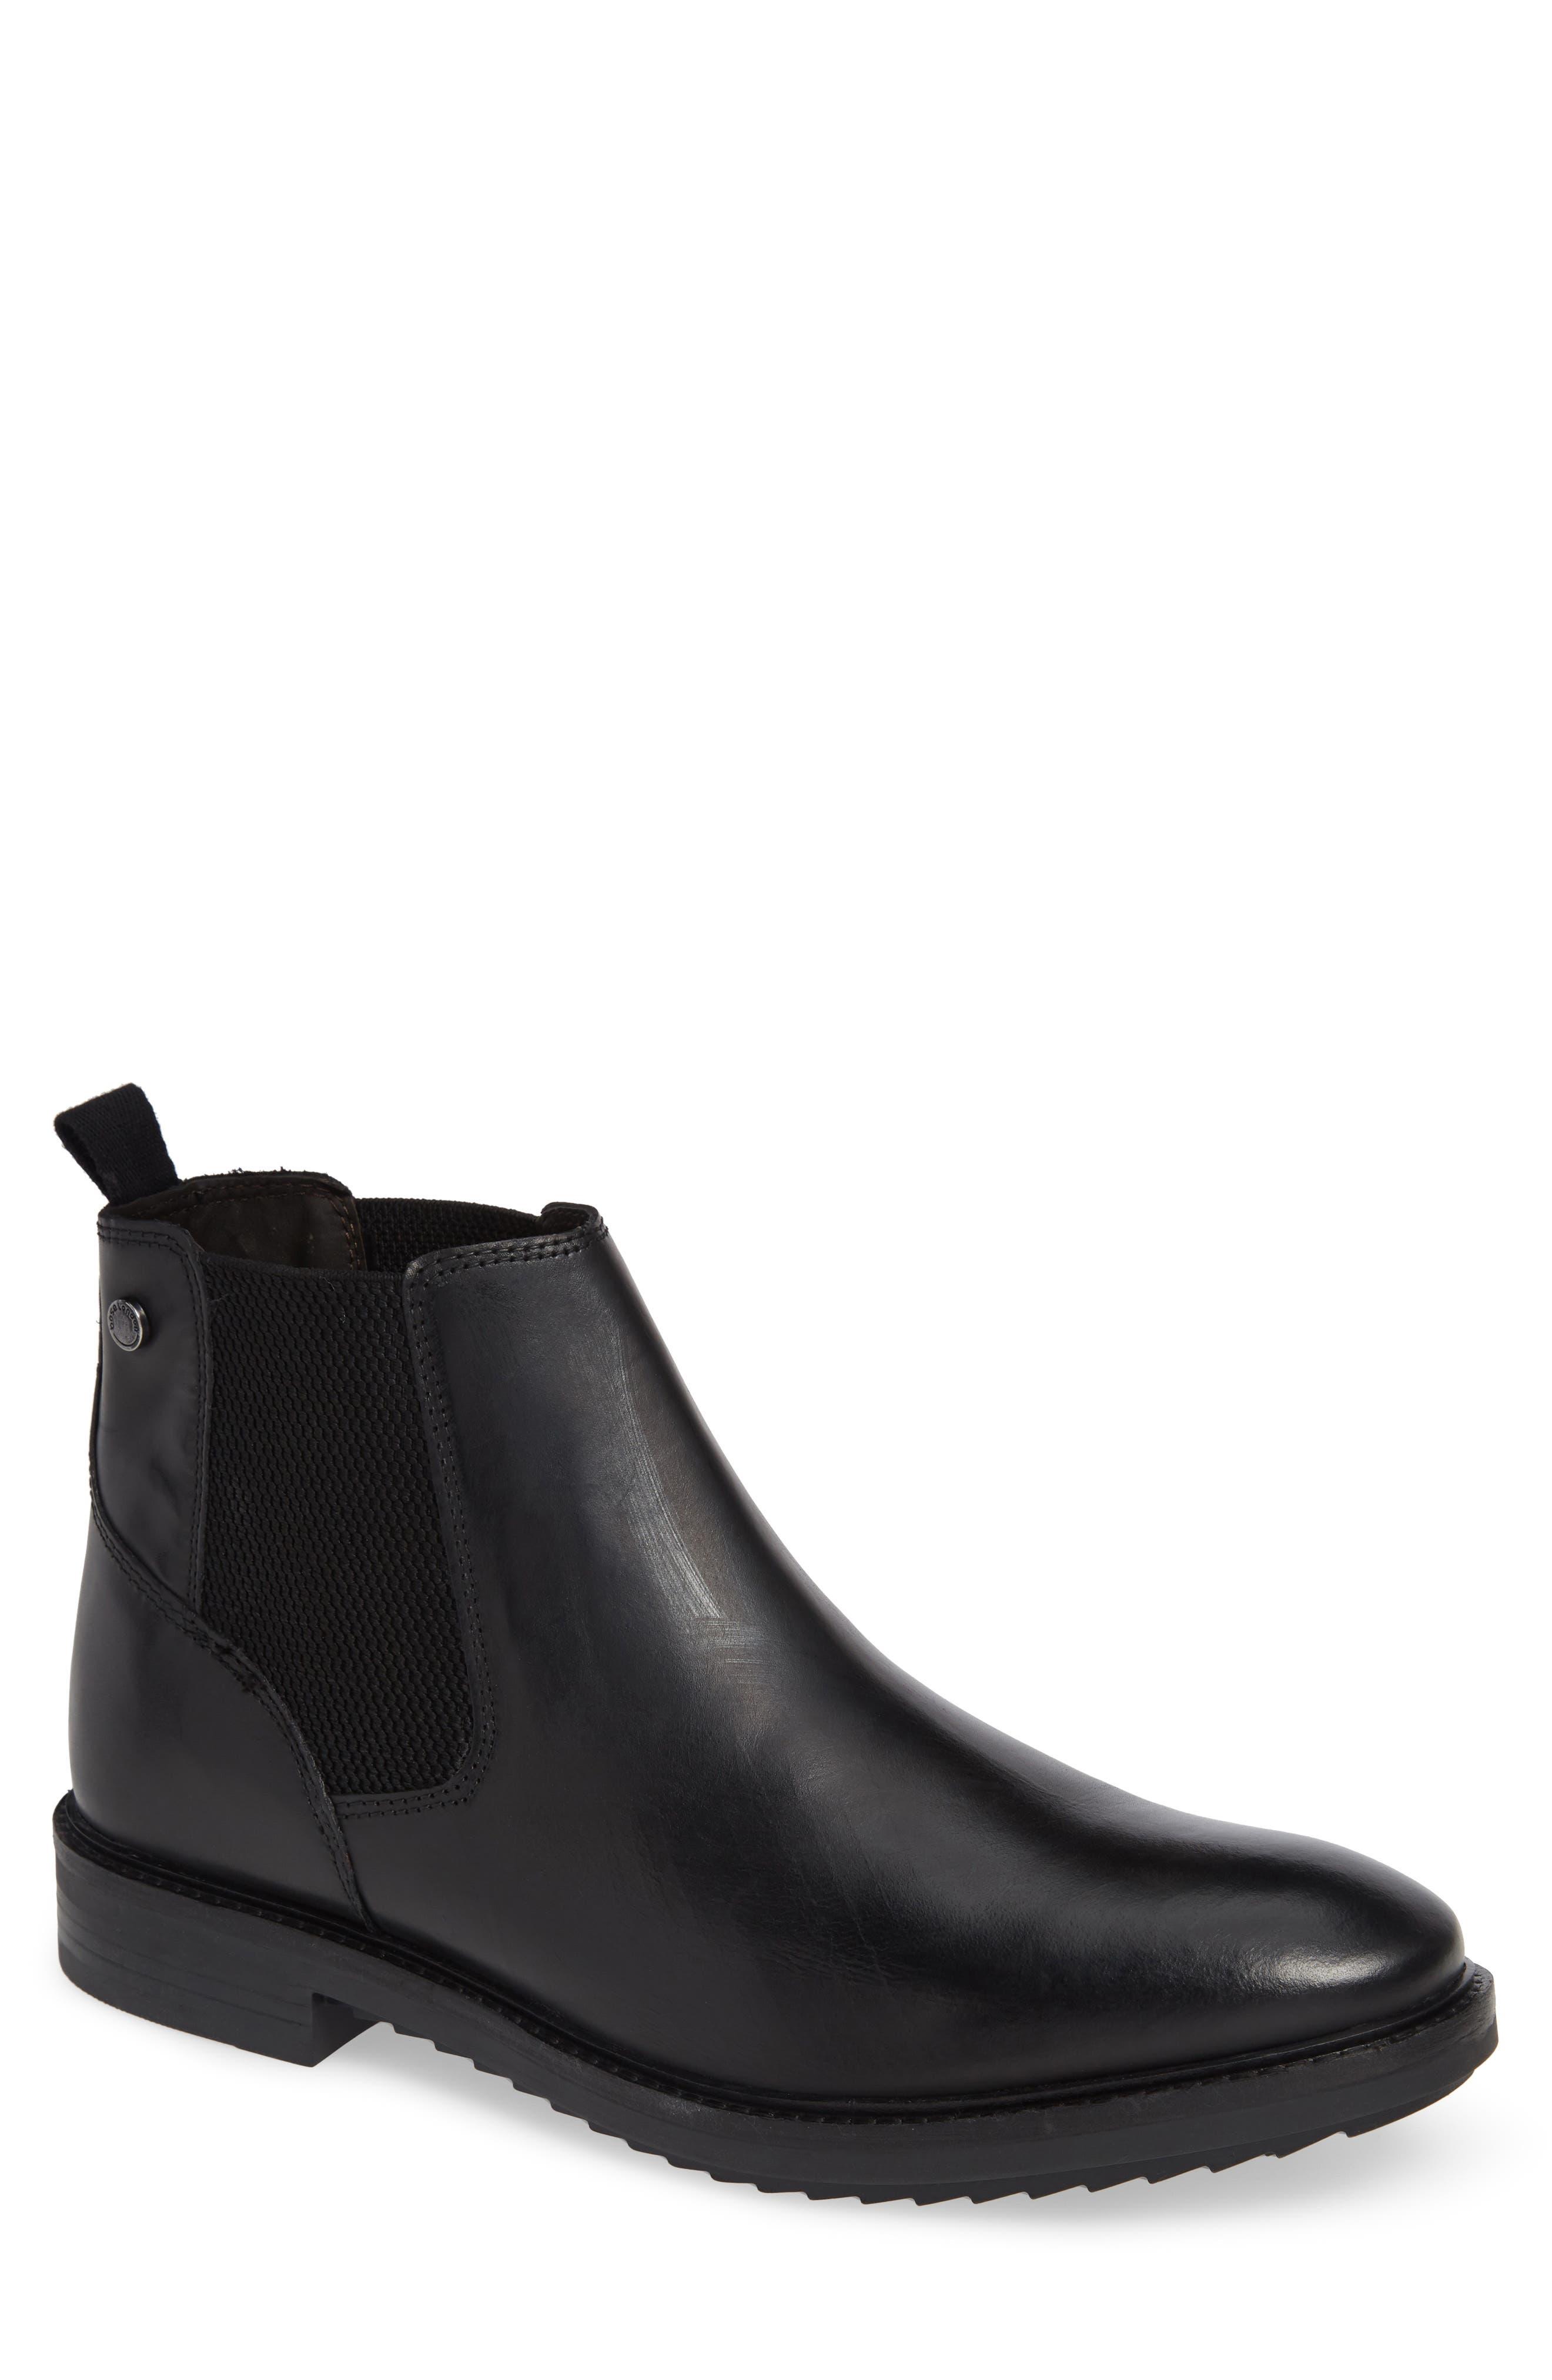 Kingsley Chelsea Boot,                         Main,                         color, BLACK